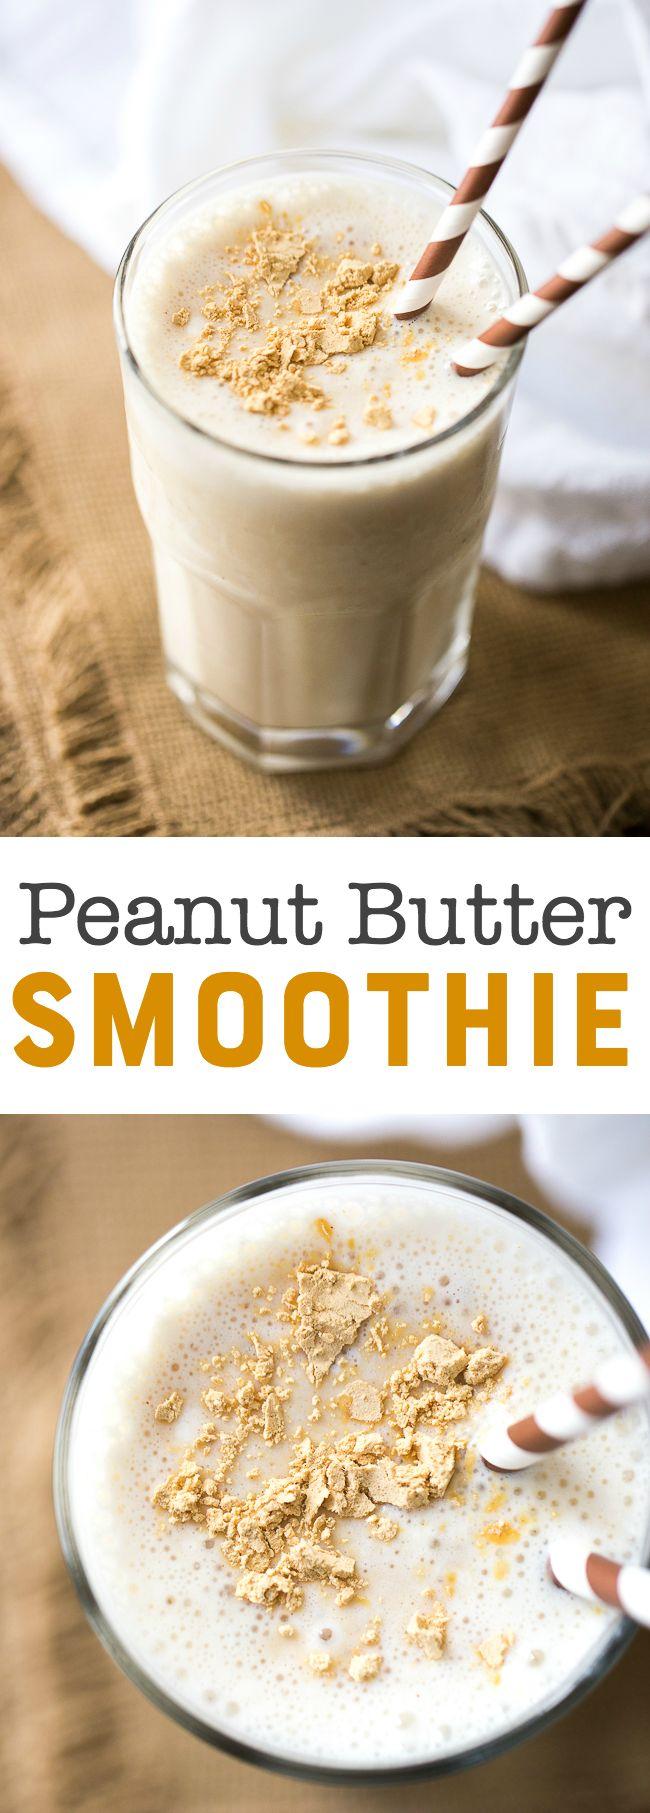 Peanut Butter Smoothie Recipe   PB2 Smoothie   Peanut Butter Banana Smoothie Recipe   Easy Smoothie   Vanilla Yogurt Smoothie